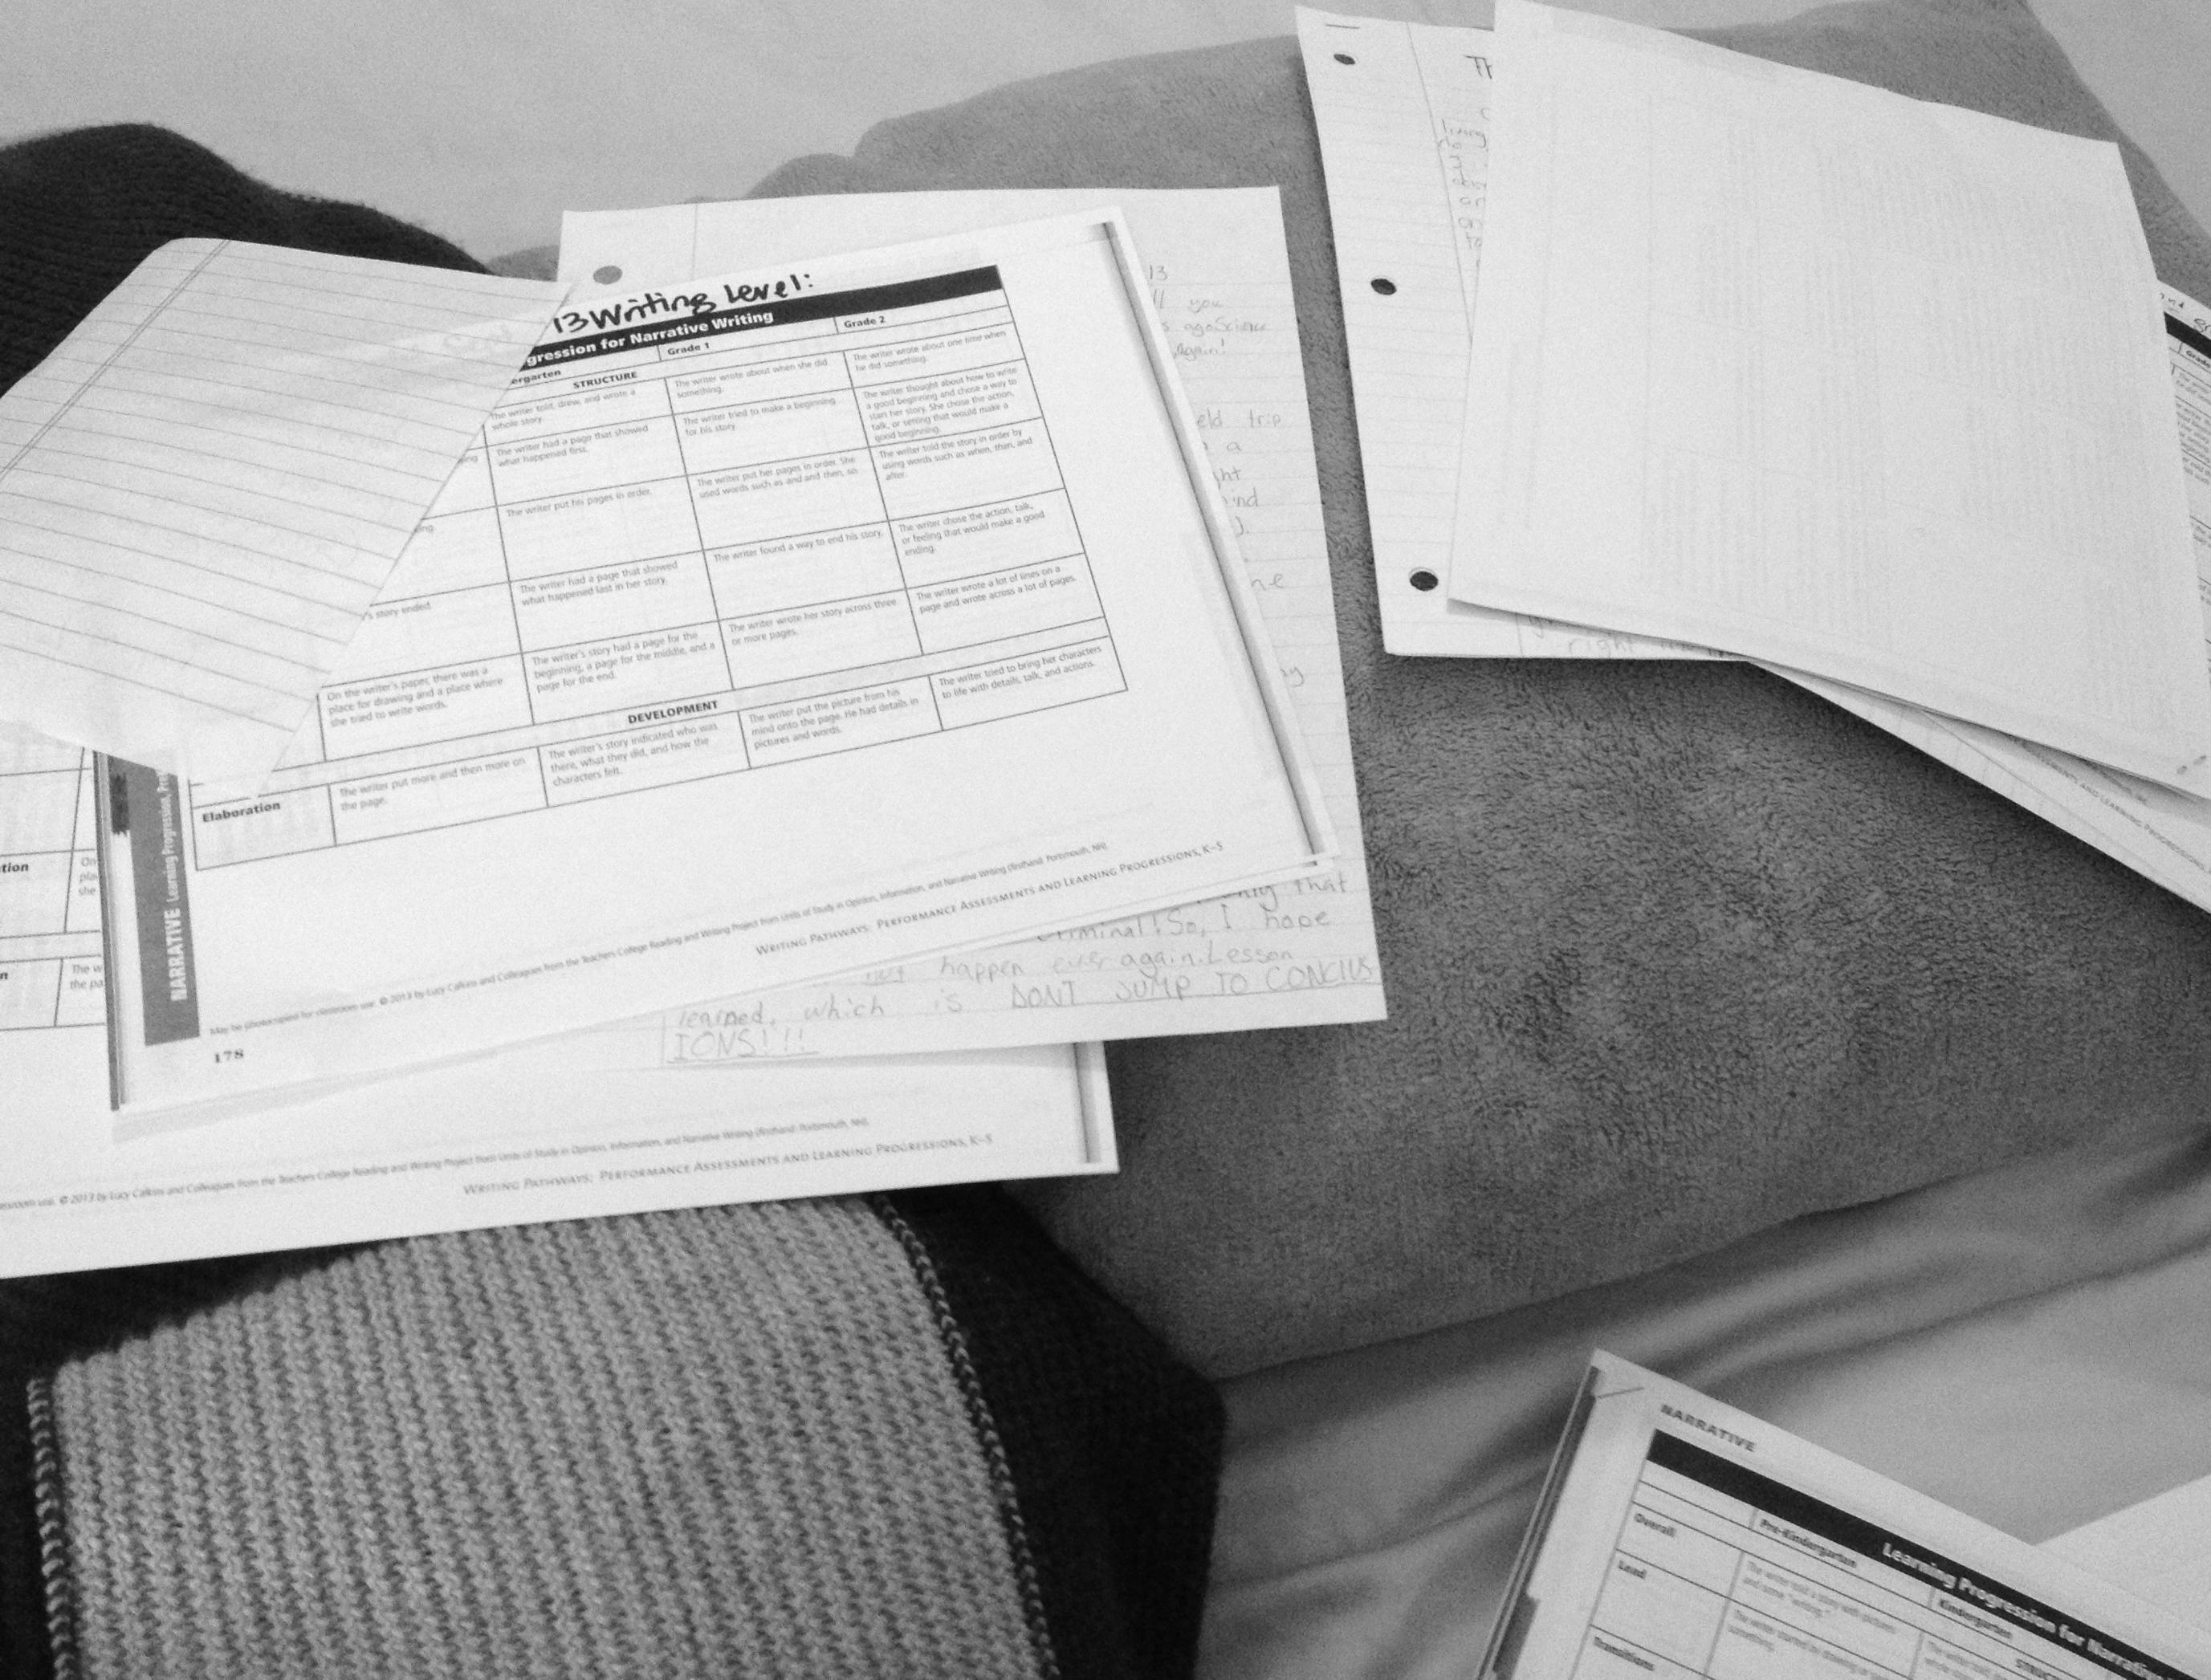 1200 word essay plans